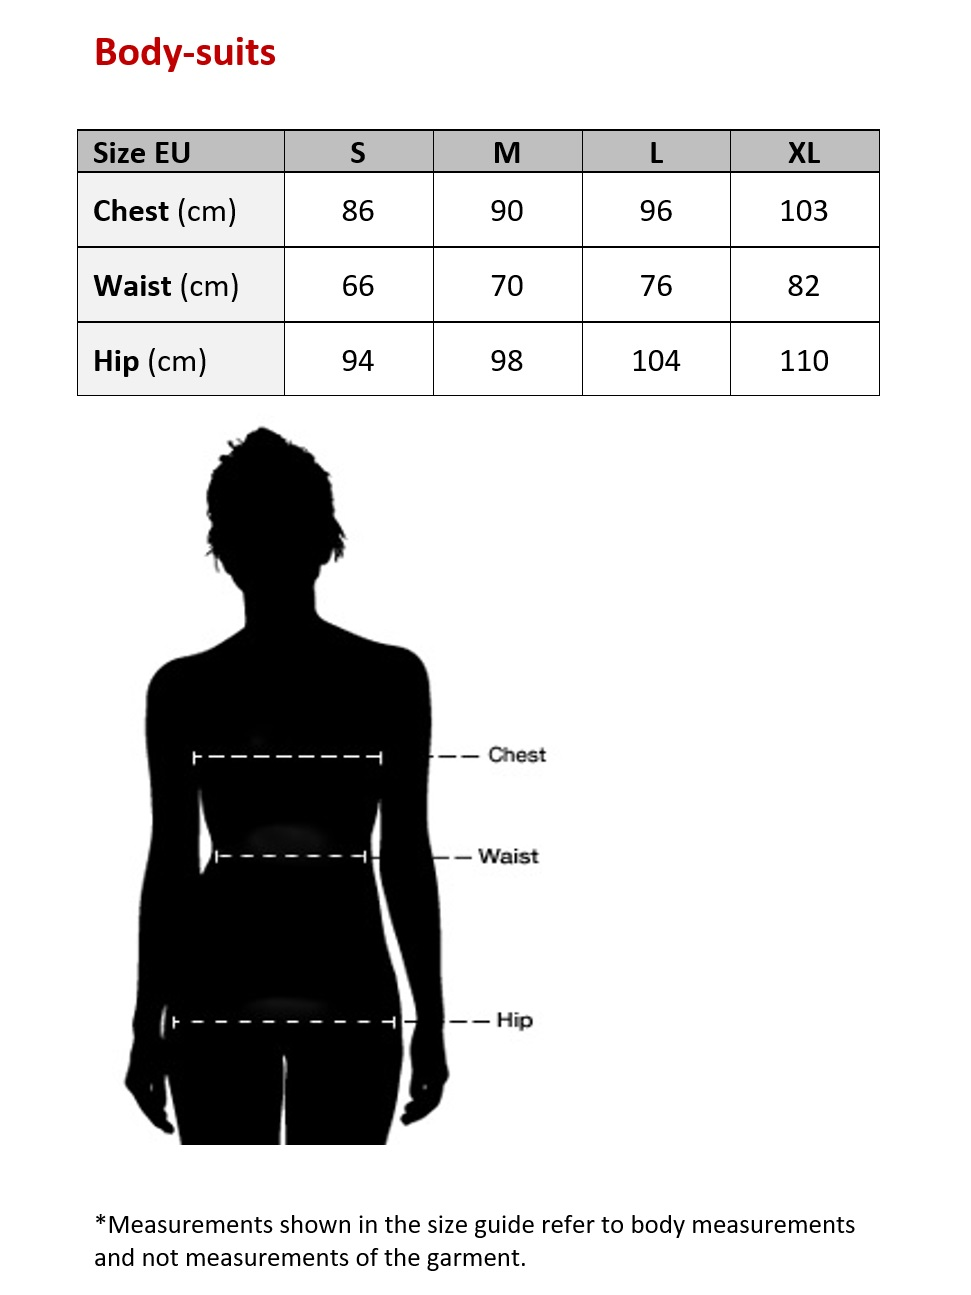 WOMAN_bodysuits.jpg